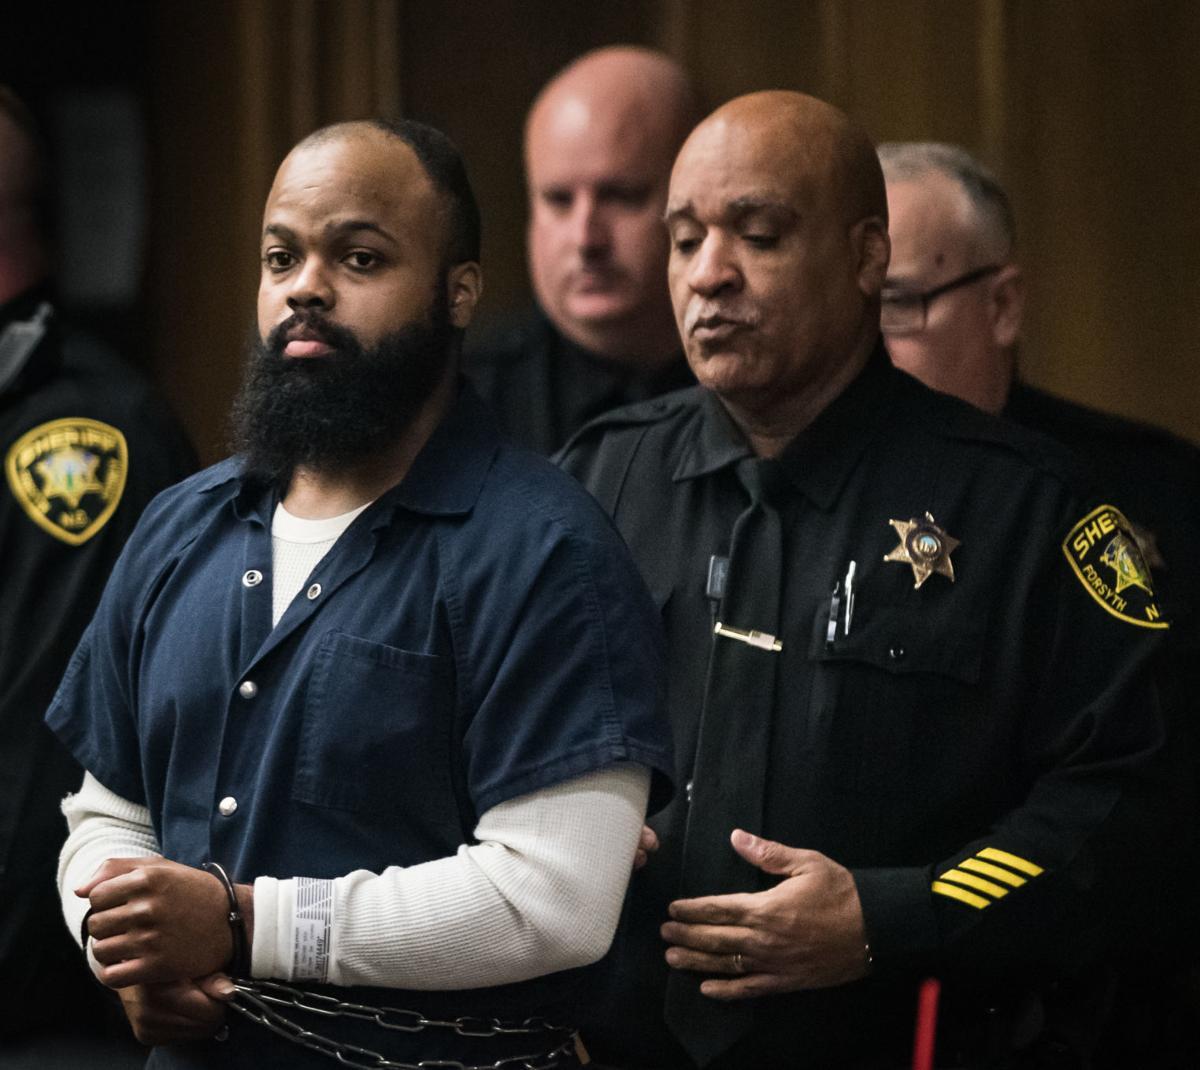 Kinzer Plea Hearing Fatal Shooting of Dominguez